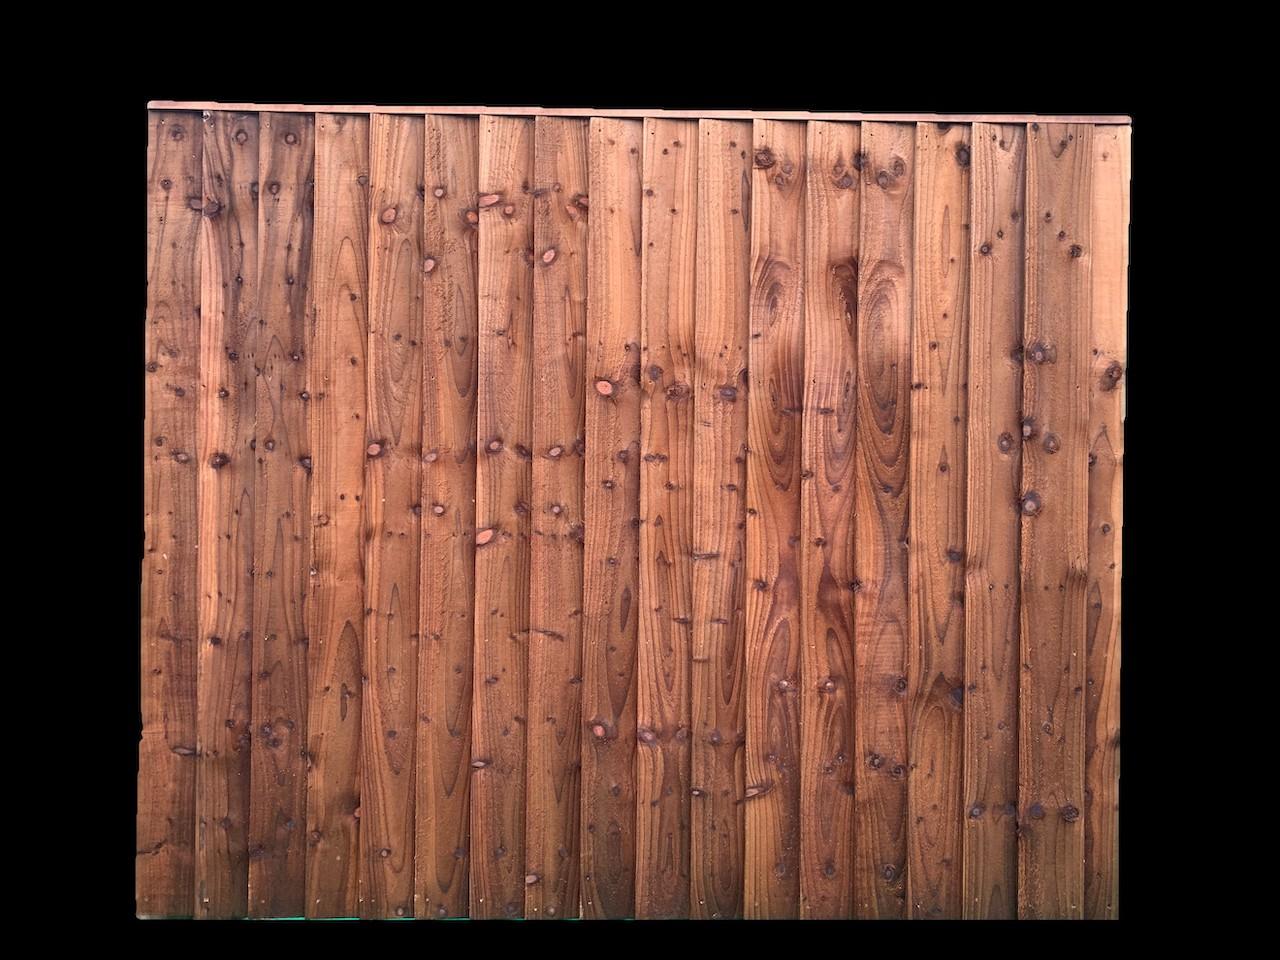 Fencing Panels in Wigan